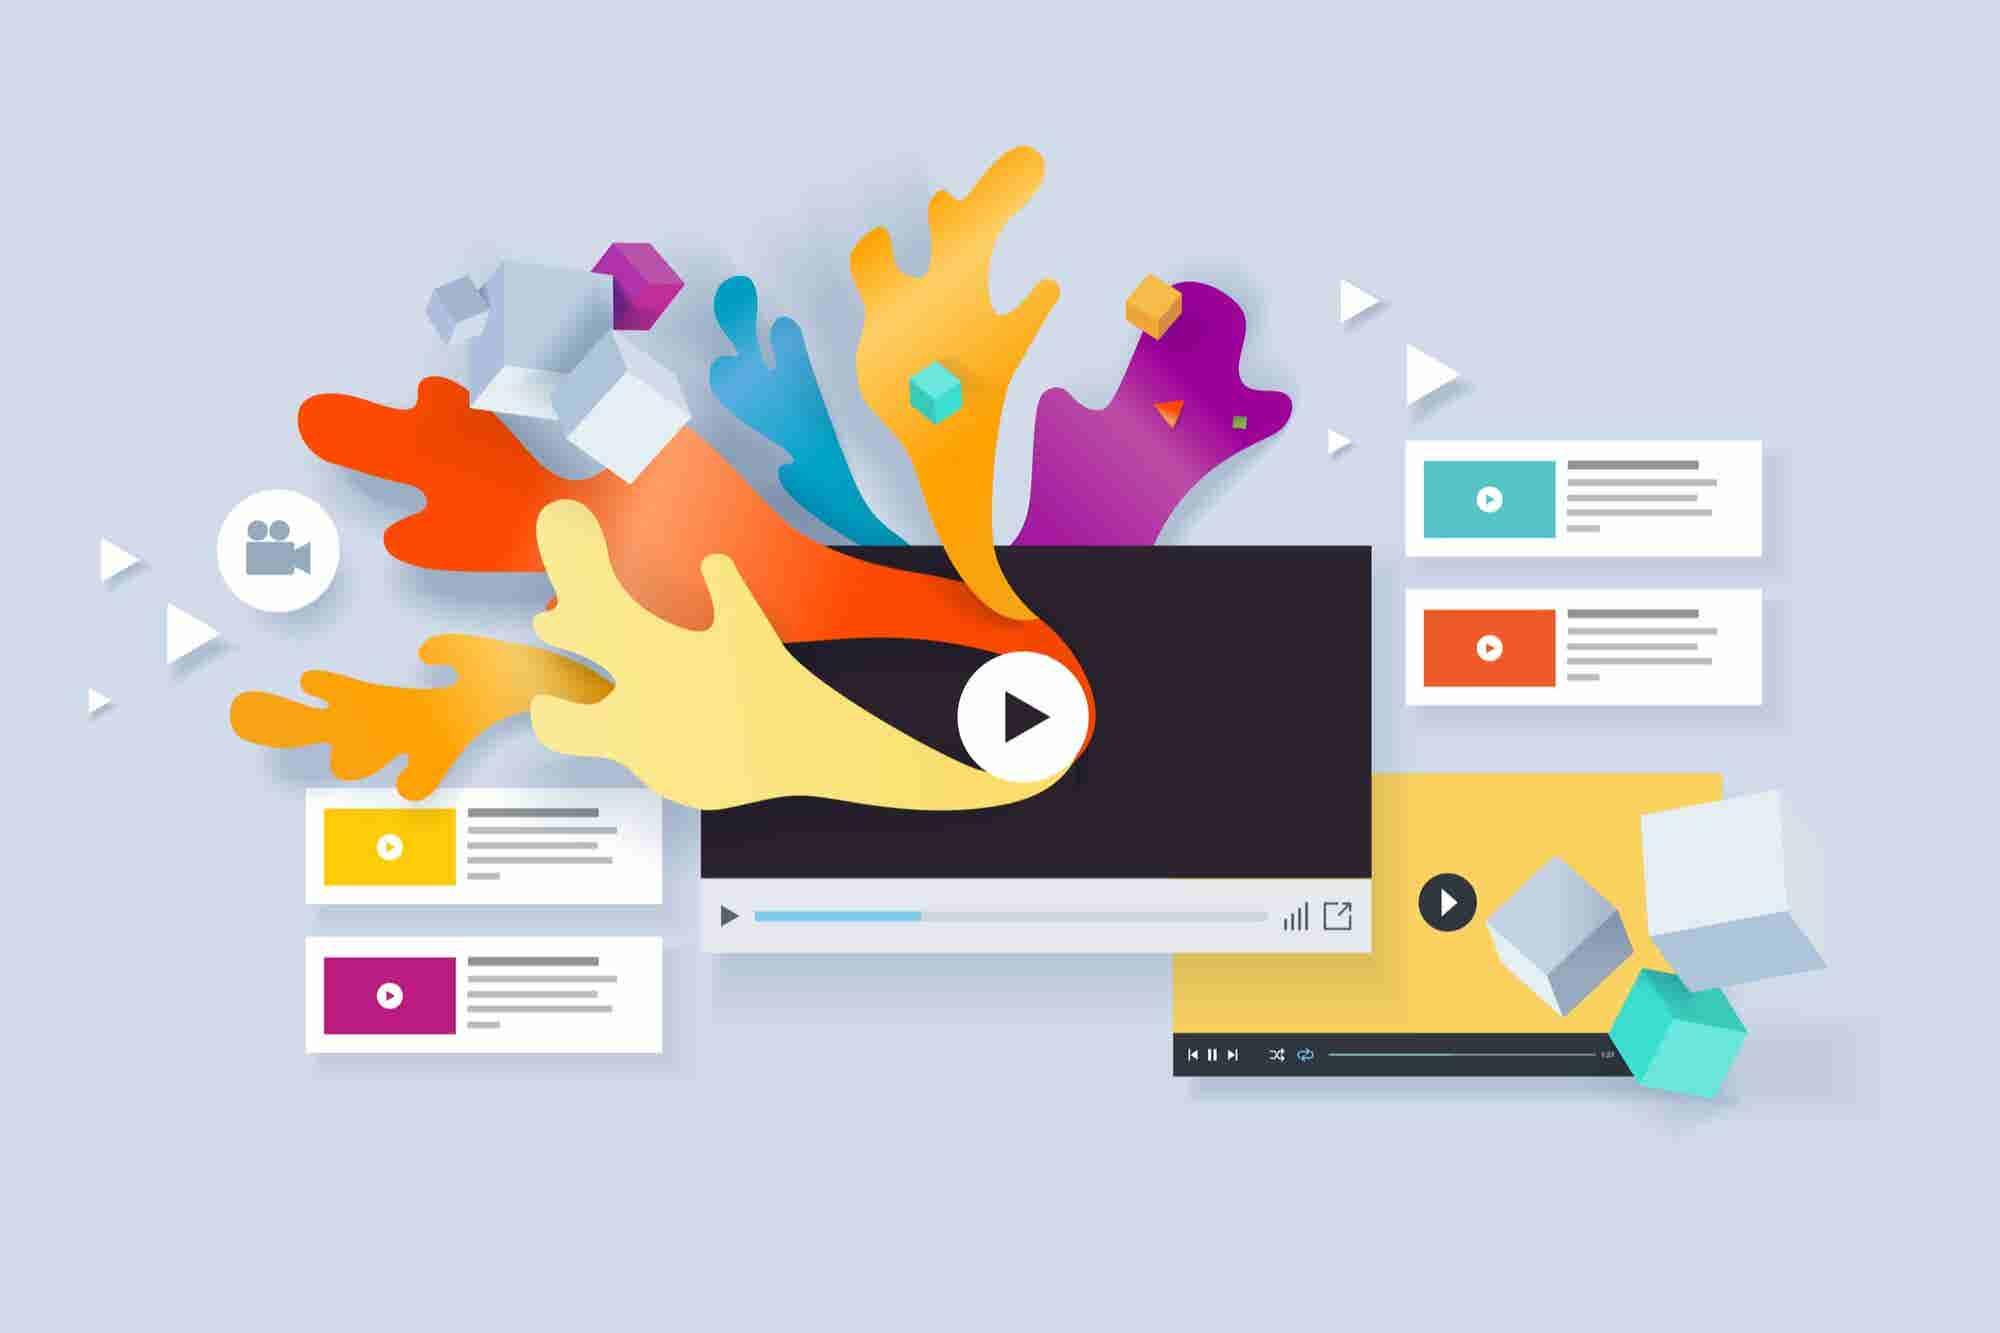 5 Channelizing Tips for Entrepreneurs to Crack the Code of Story Marketing on Social Media Platform